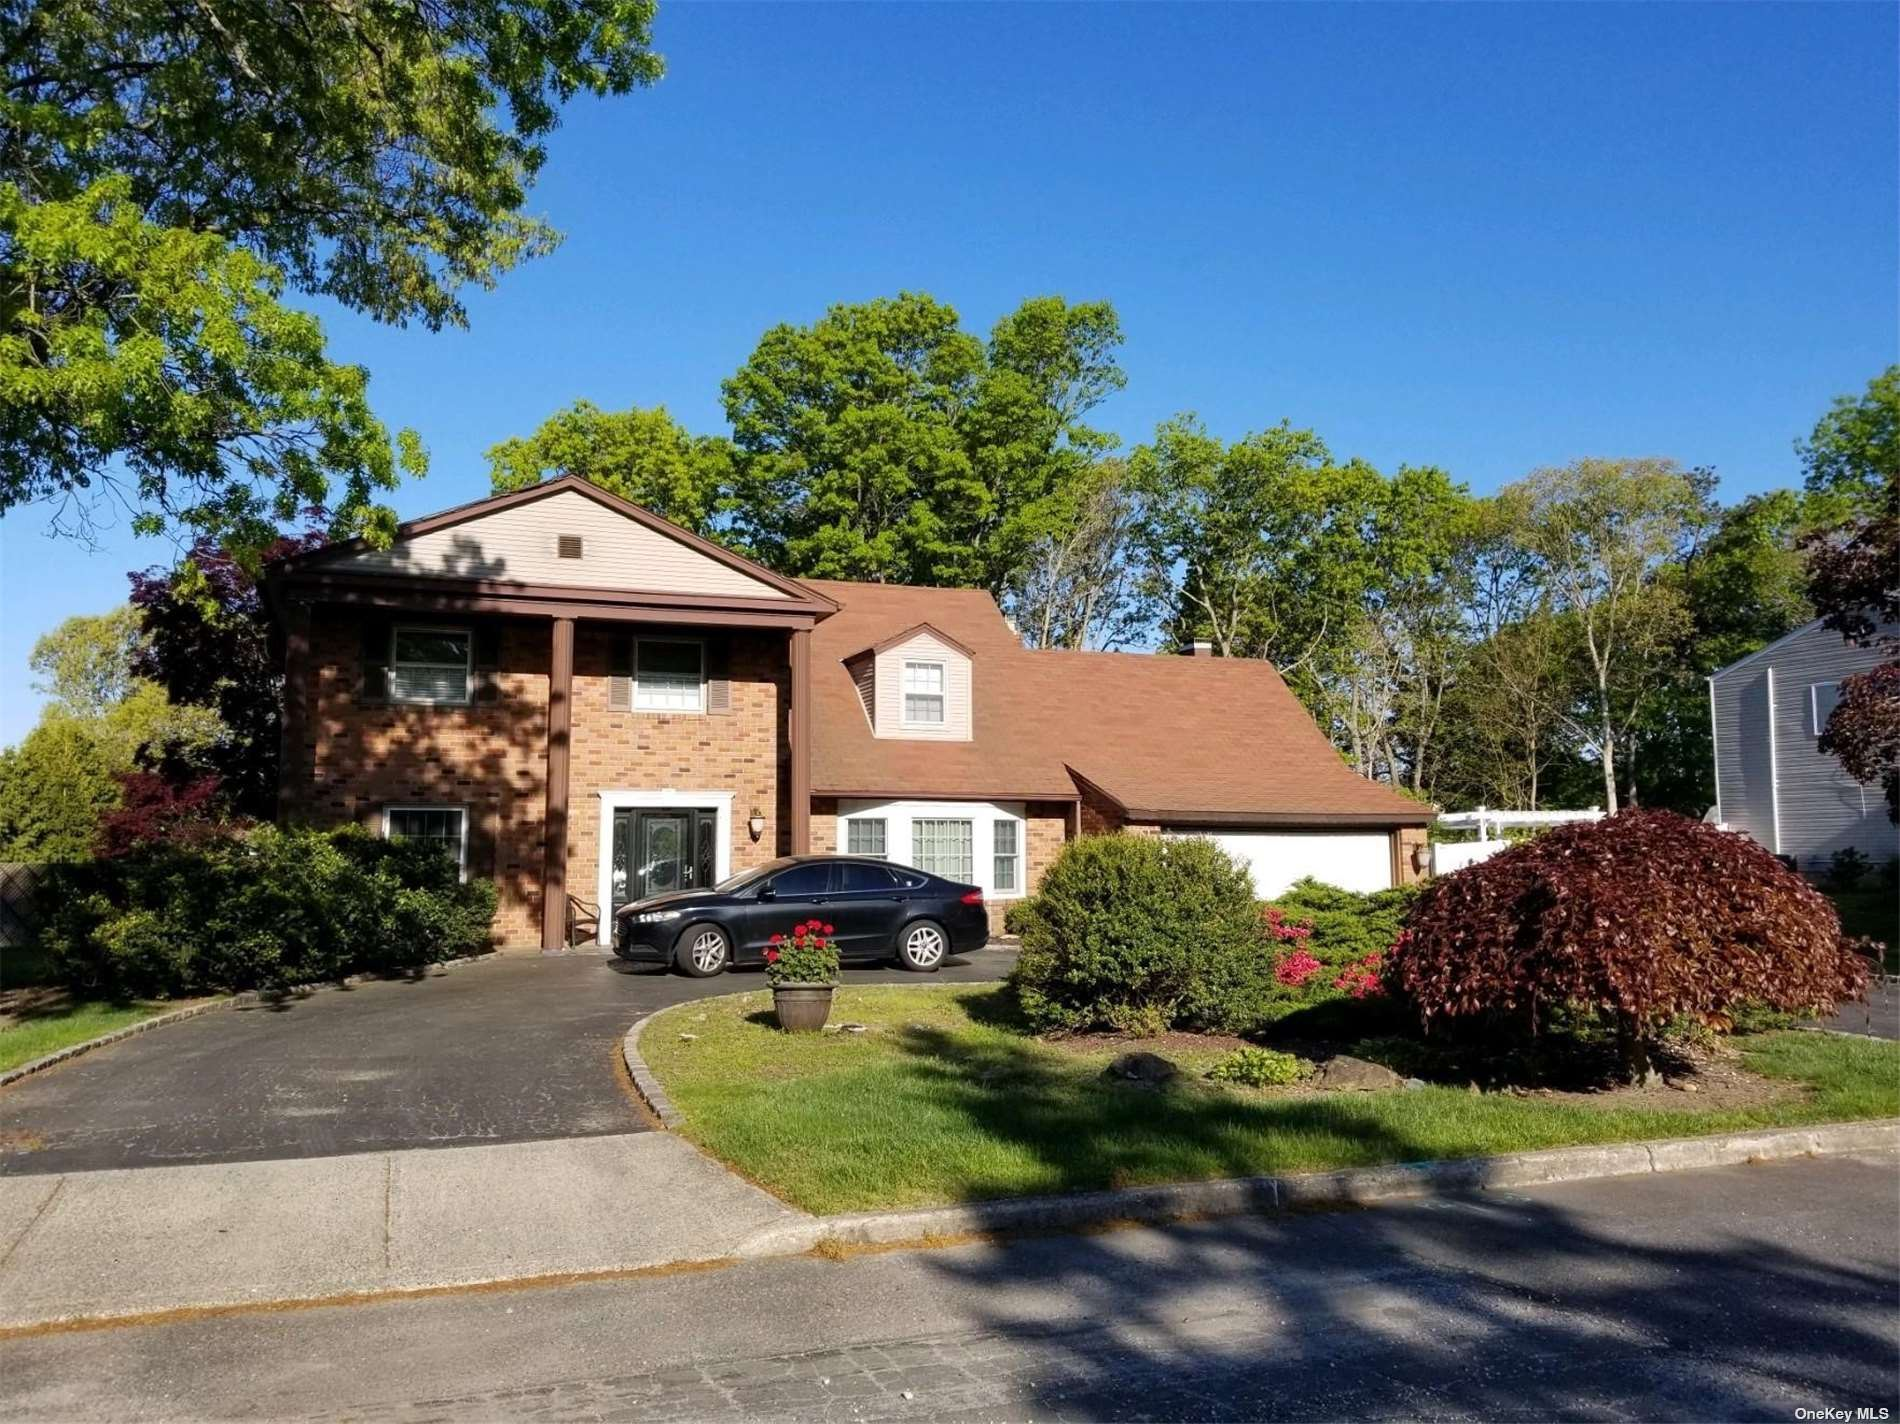 8 Greenbrier Avenue, Farmingville, NY 11738 - MLS#: 3291692